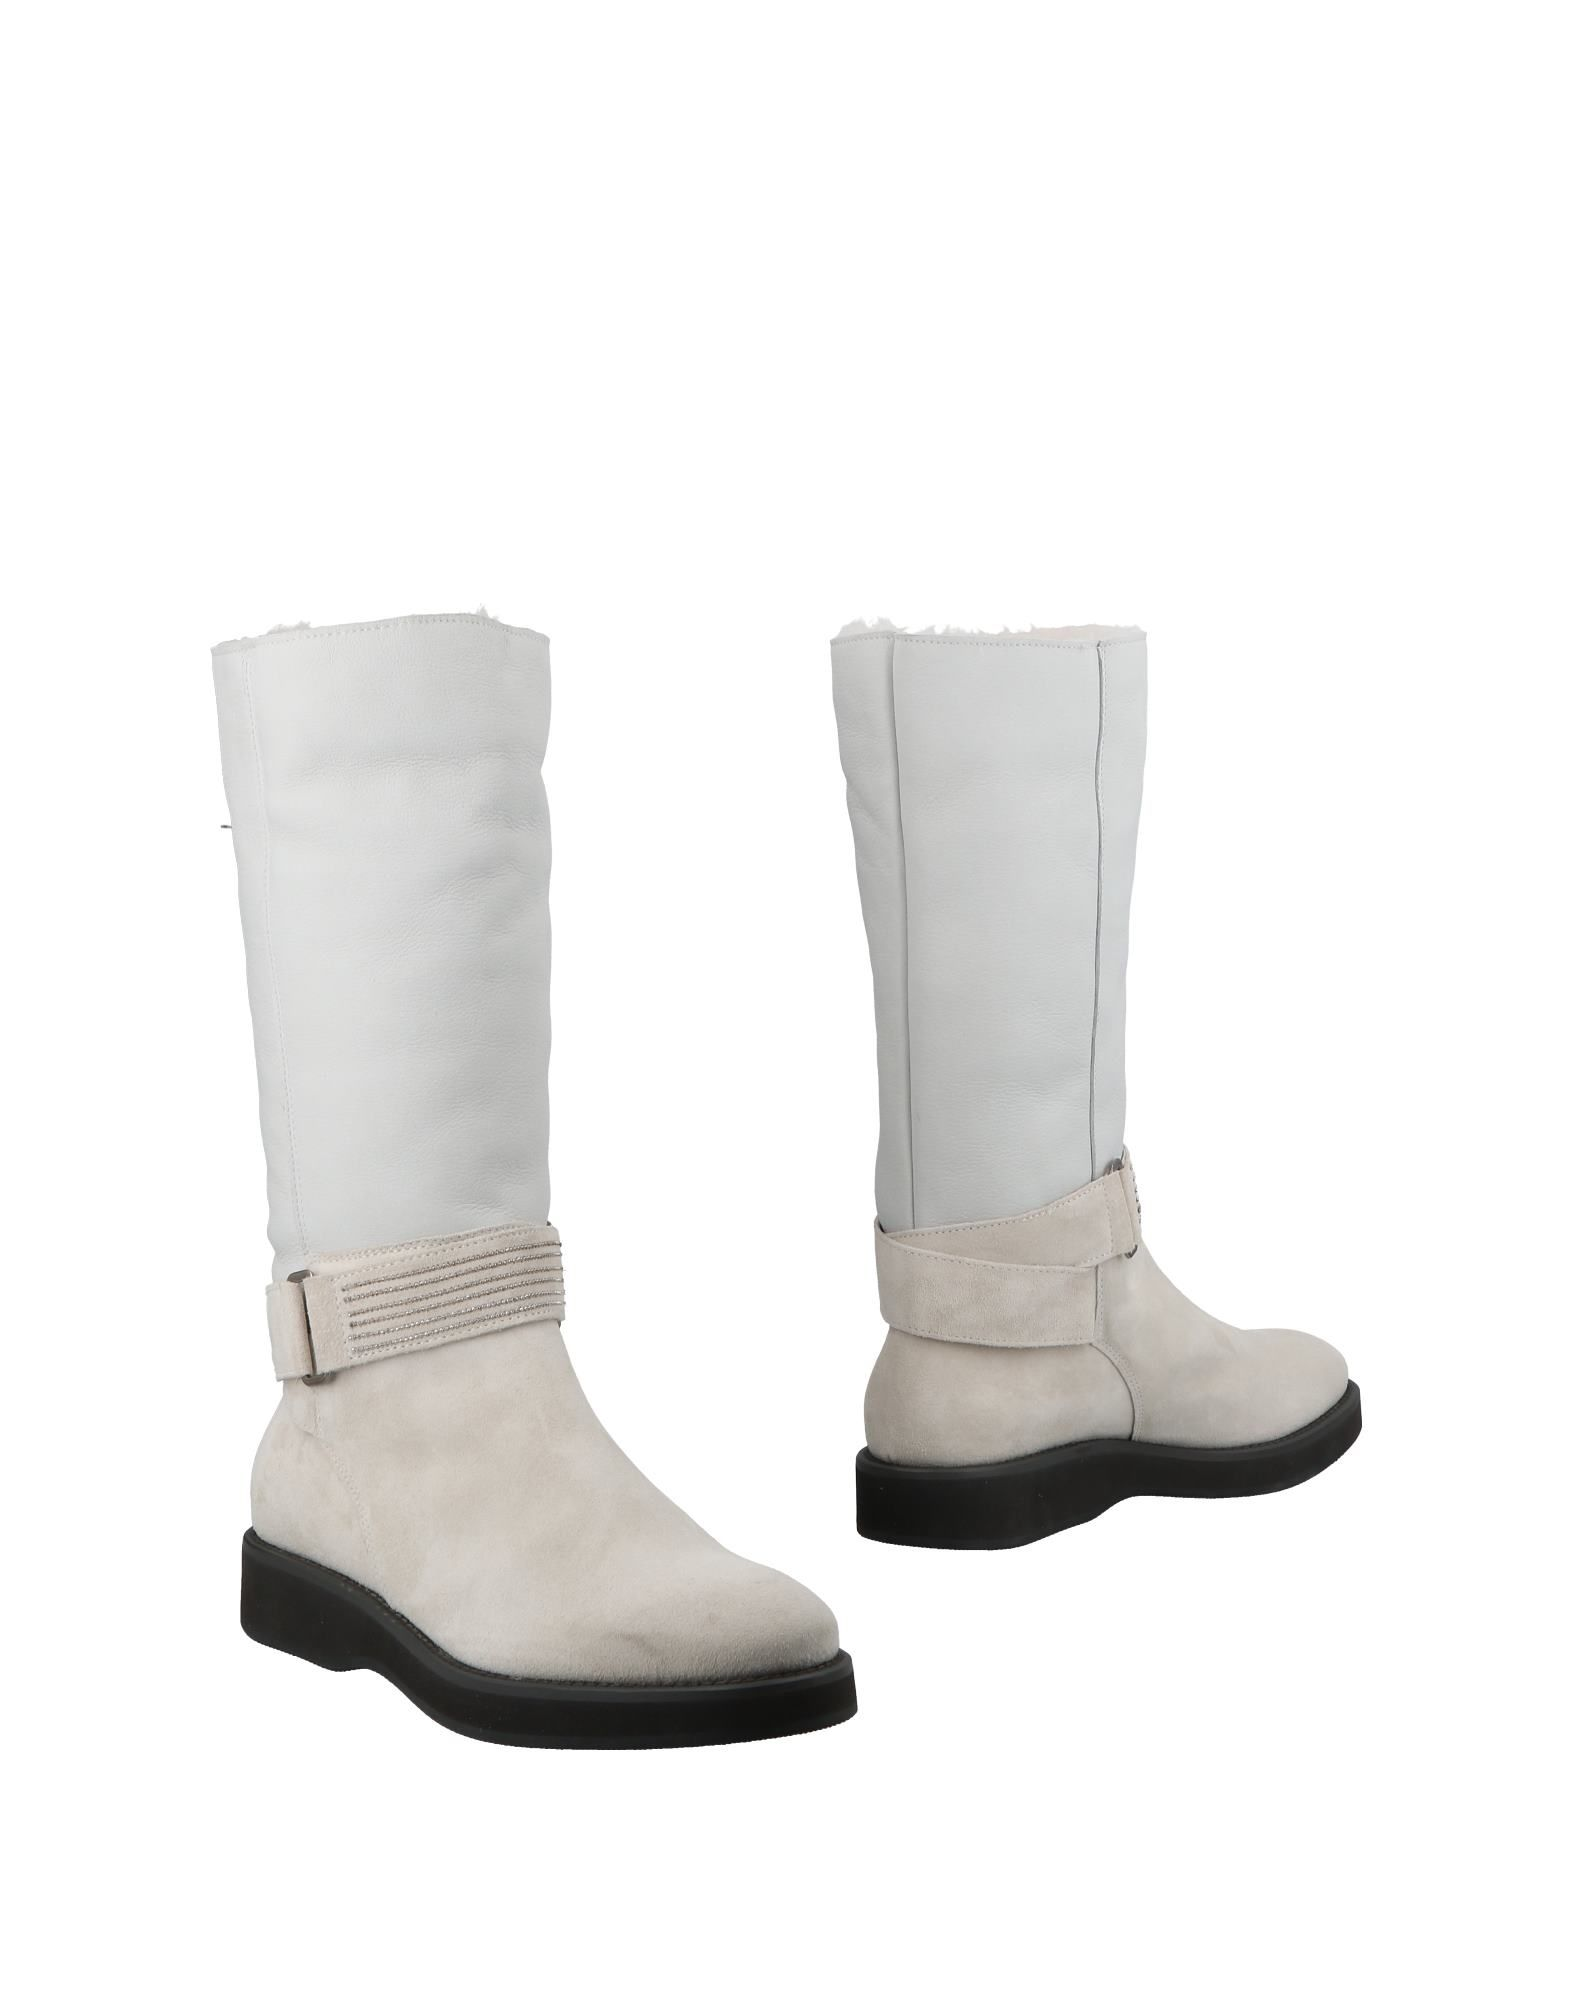 Fabiana Filippi Stiefel 11504103DQ Damen  11504103DQ Stiefel Neue Schuhe c683b5